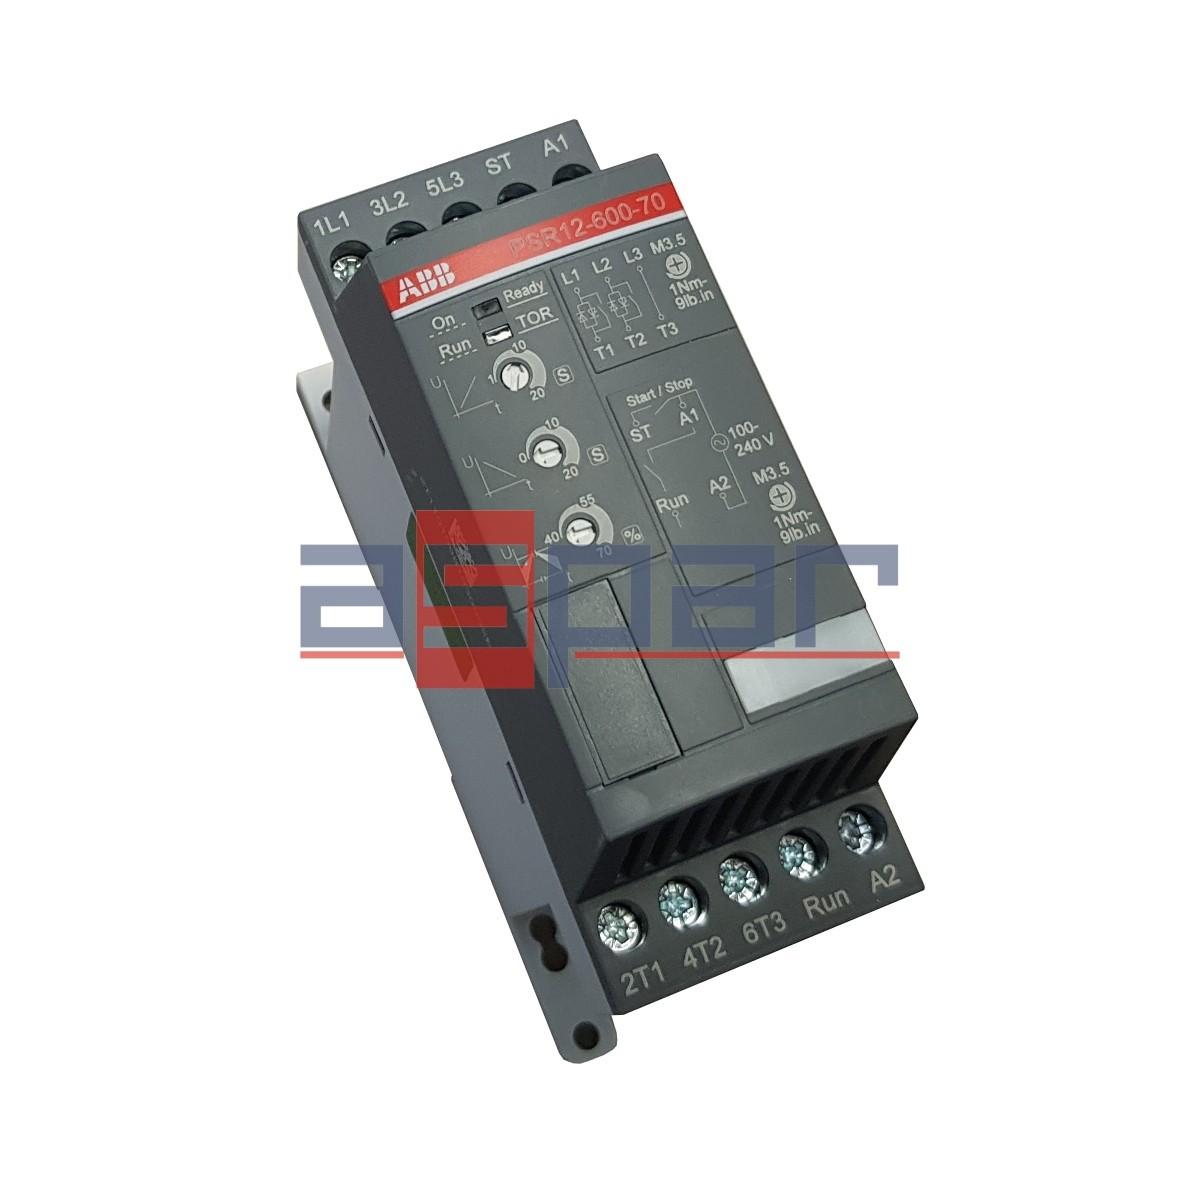 Softstart 5,5kW, PSR12-600-70